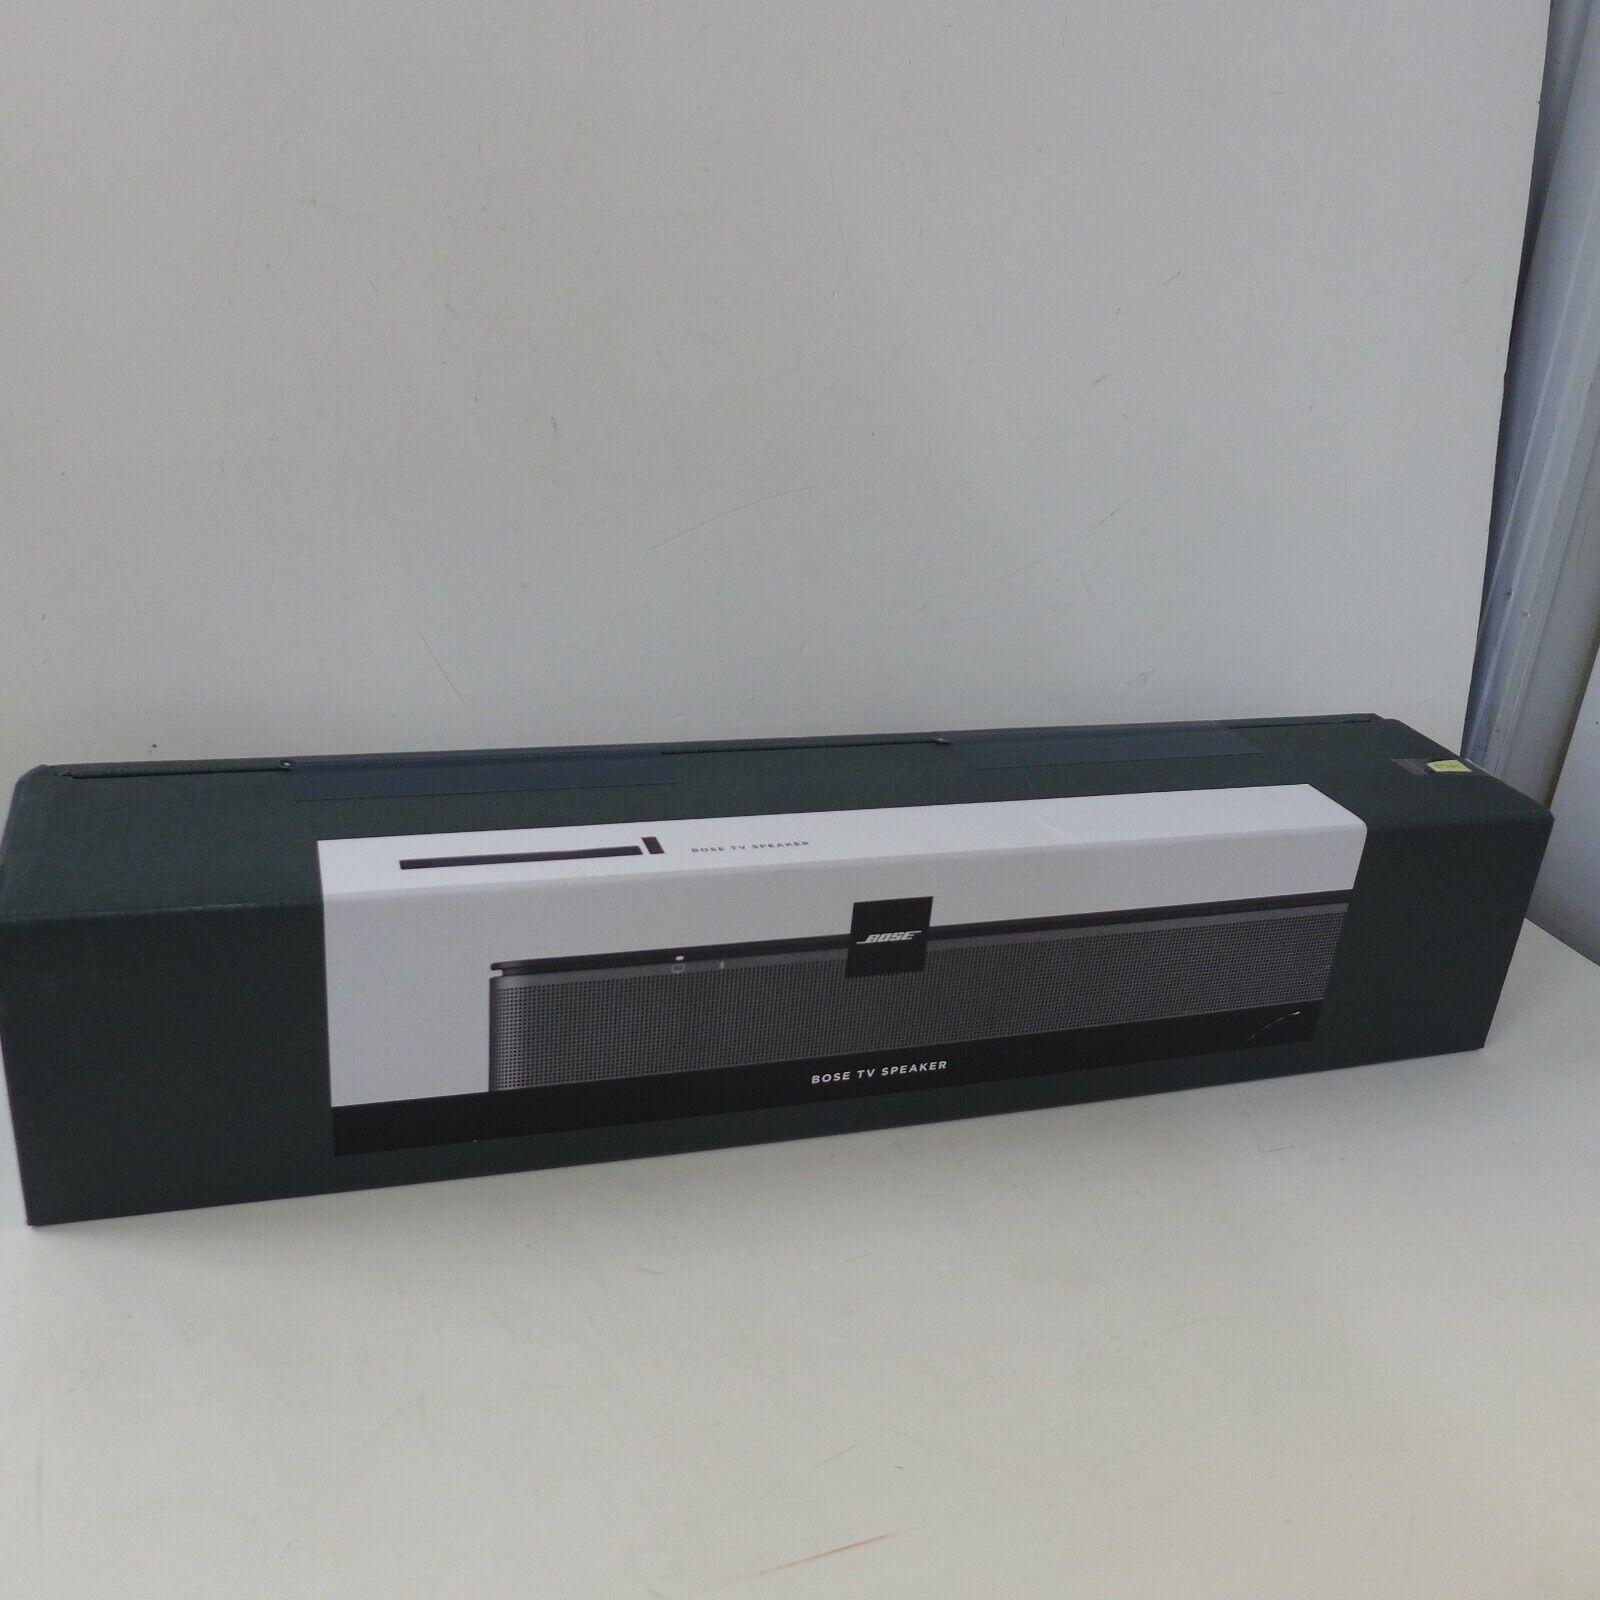 Bose Sound-bar TV Speaker Bluetooth120V 838309-1100 *NEW*. Buy it now for 220.00